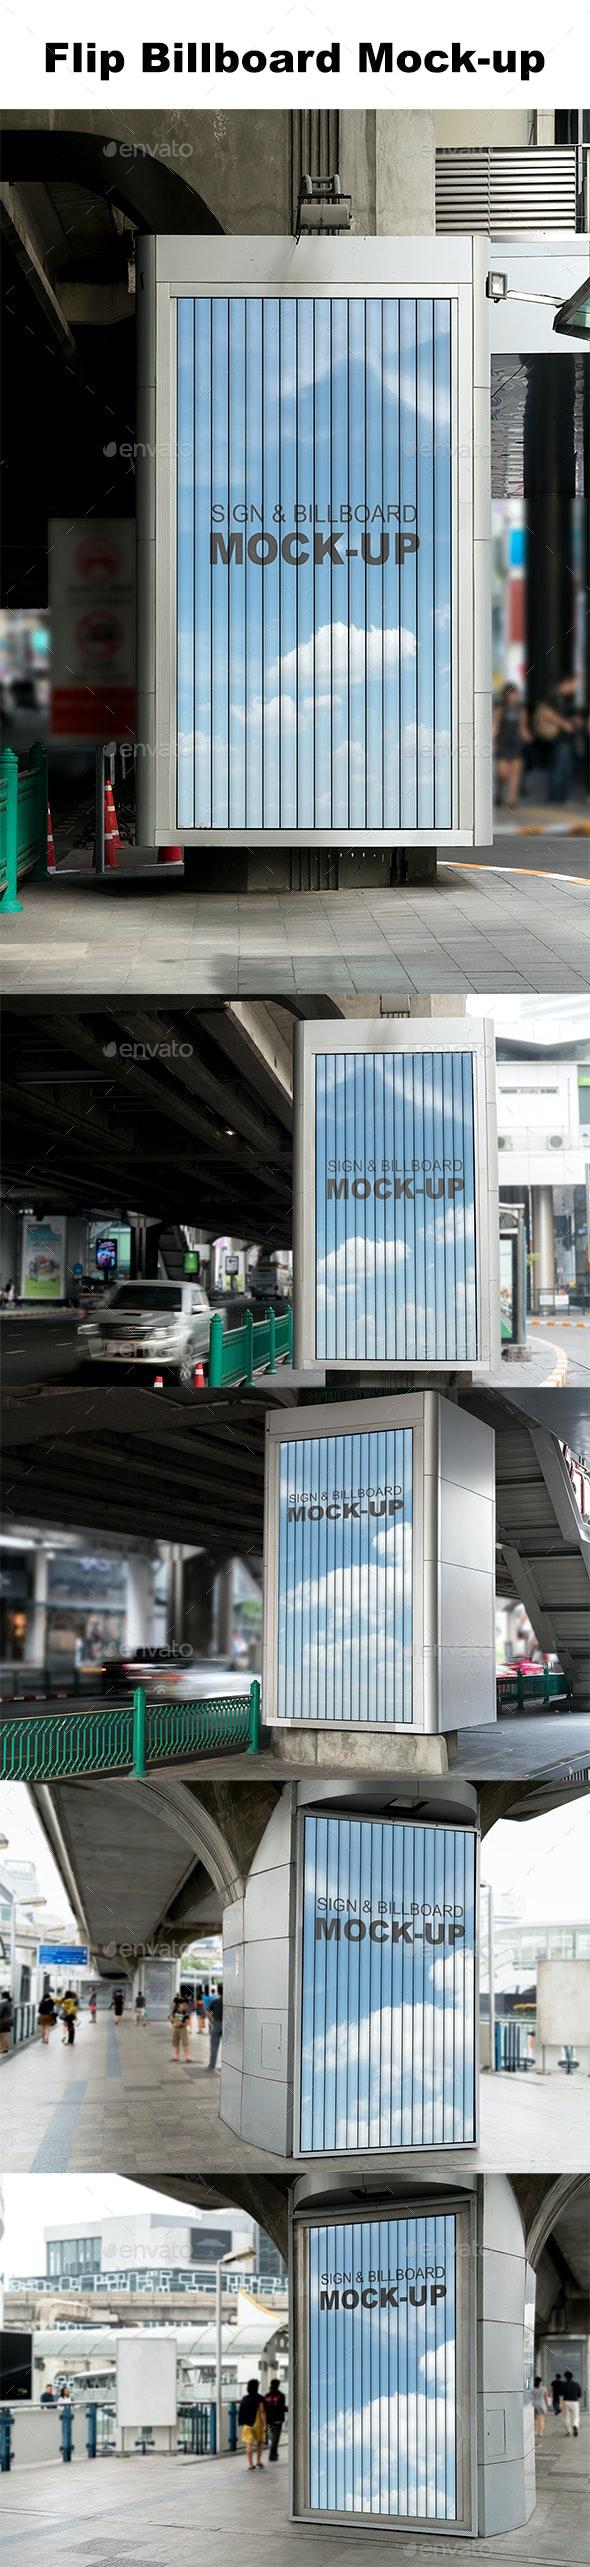 Street Billboard Mockup Template - Product Mock-Ups Graphics